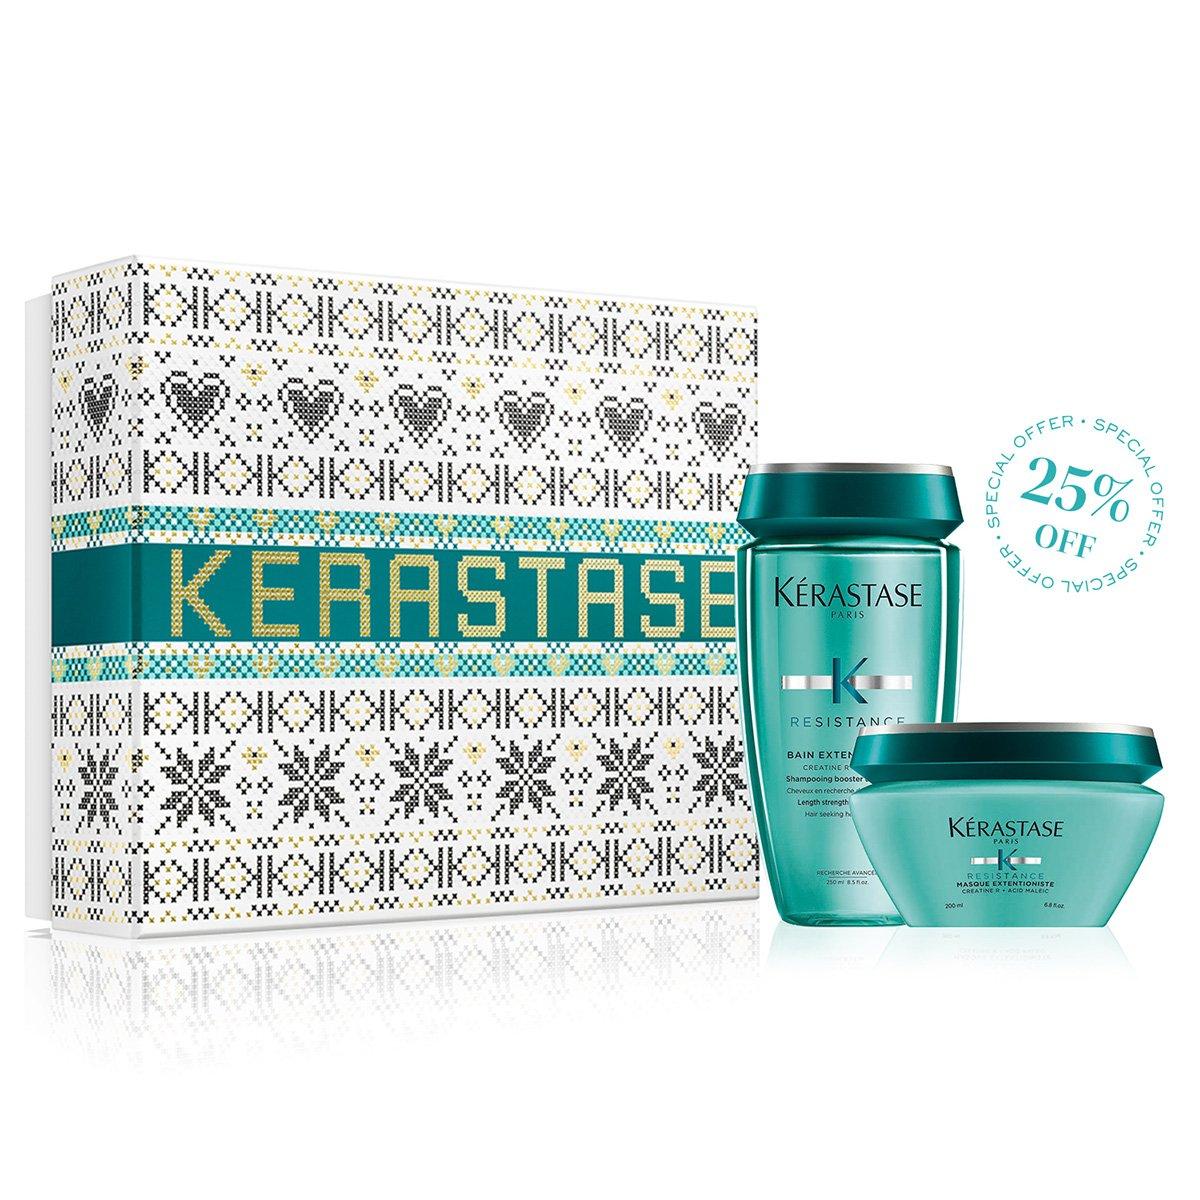 Kit Kérastase Coffret Extentioniste Shampoo + Máscara de Tratamento